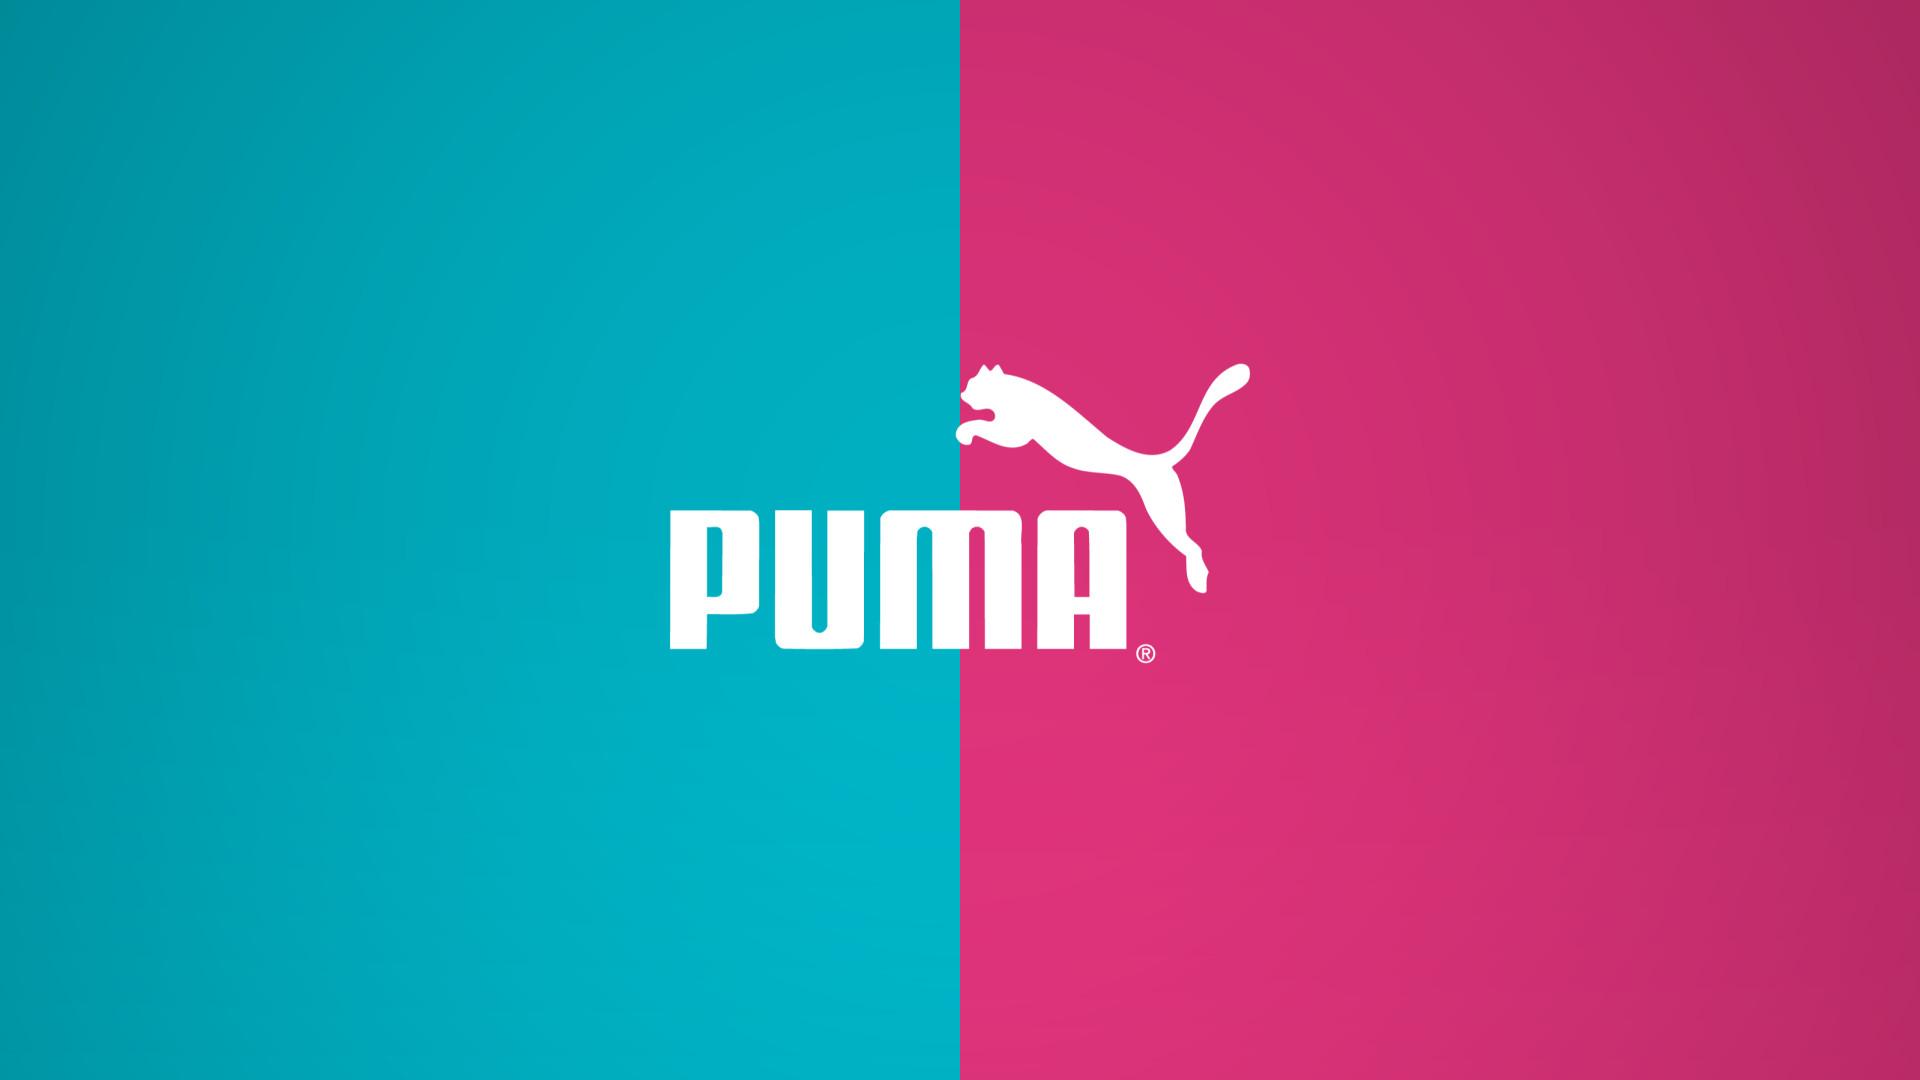 px – Puma